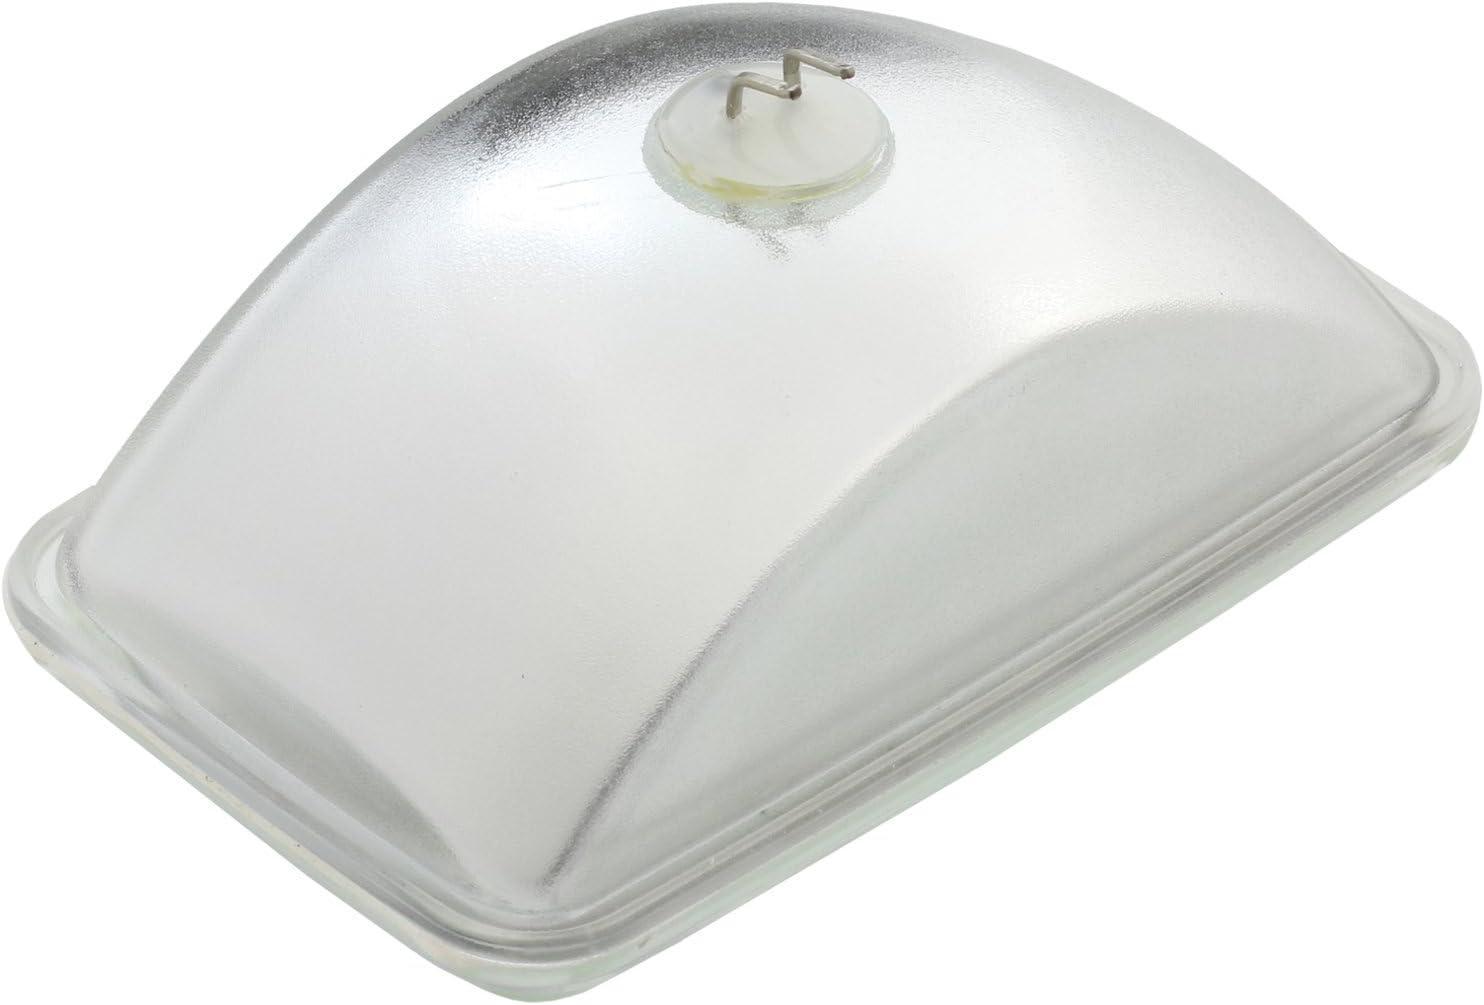 Box of 1 Wagner Lighting H9405 Sealed Beam